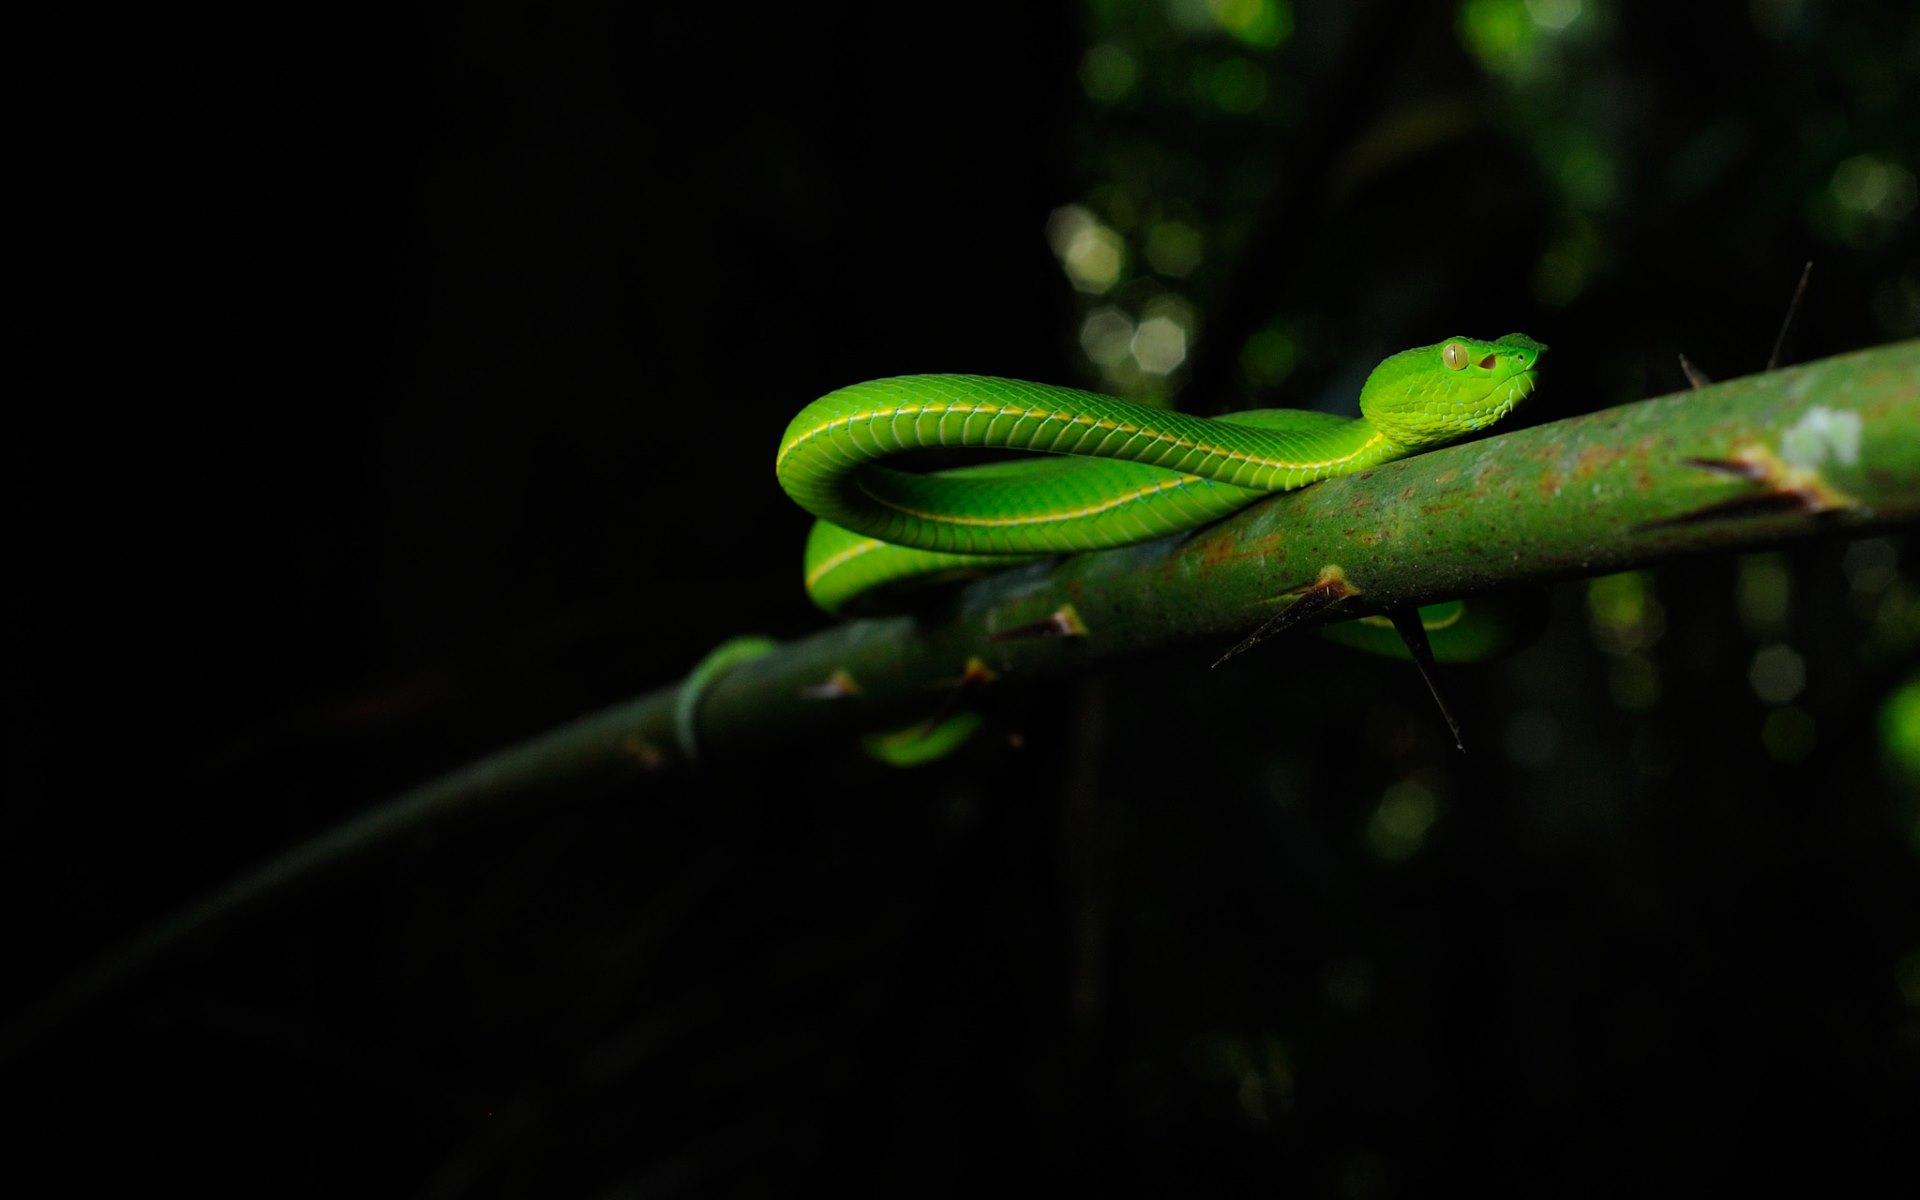 Pit viper snake wallpaper - photo#4